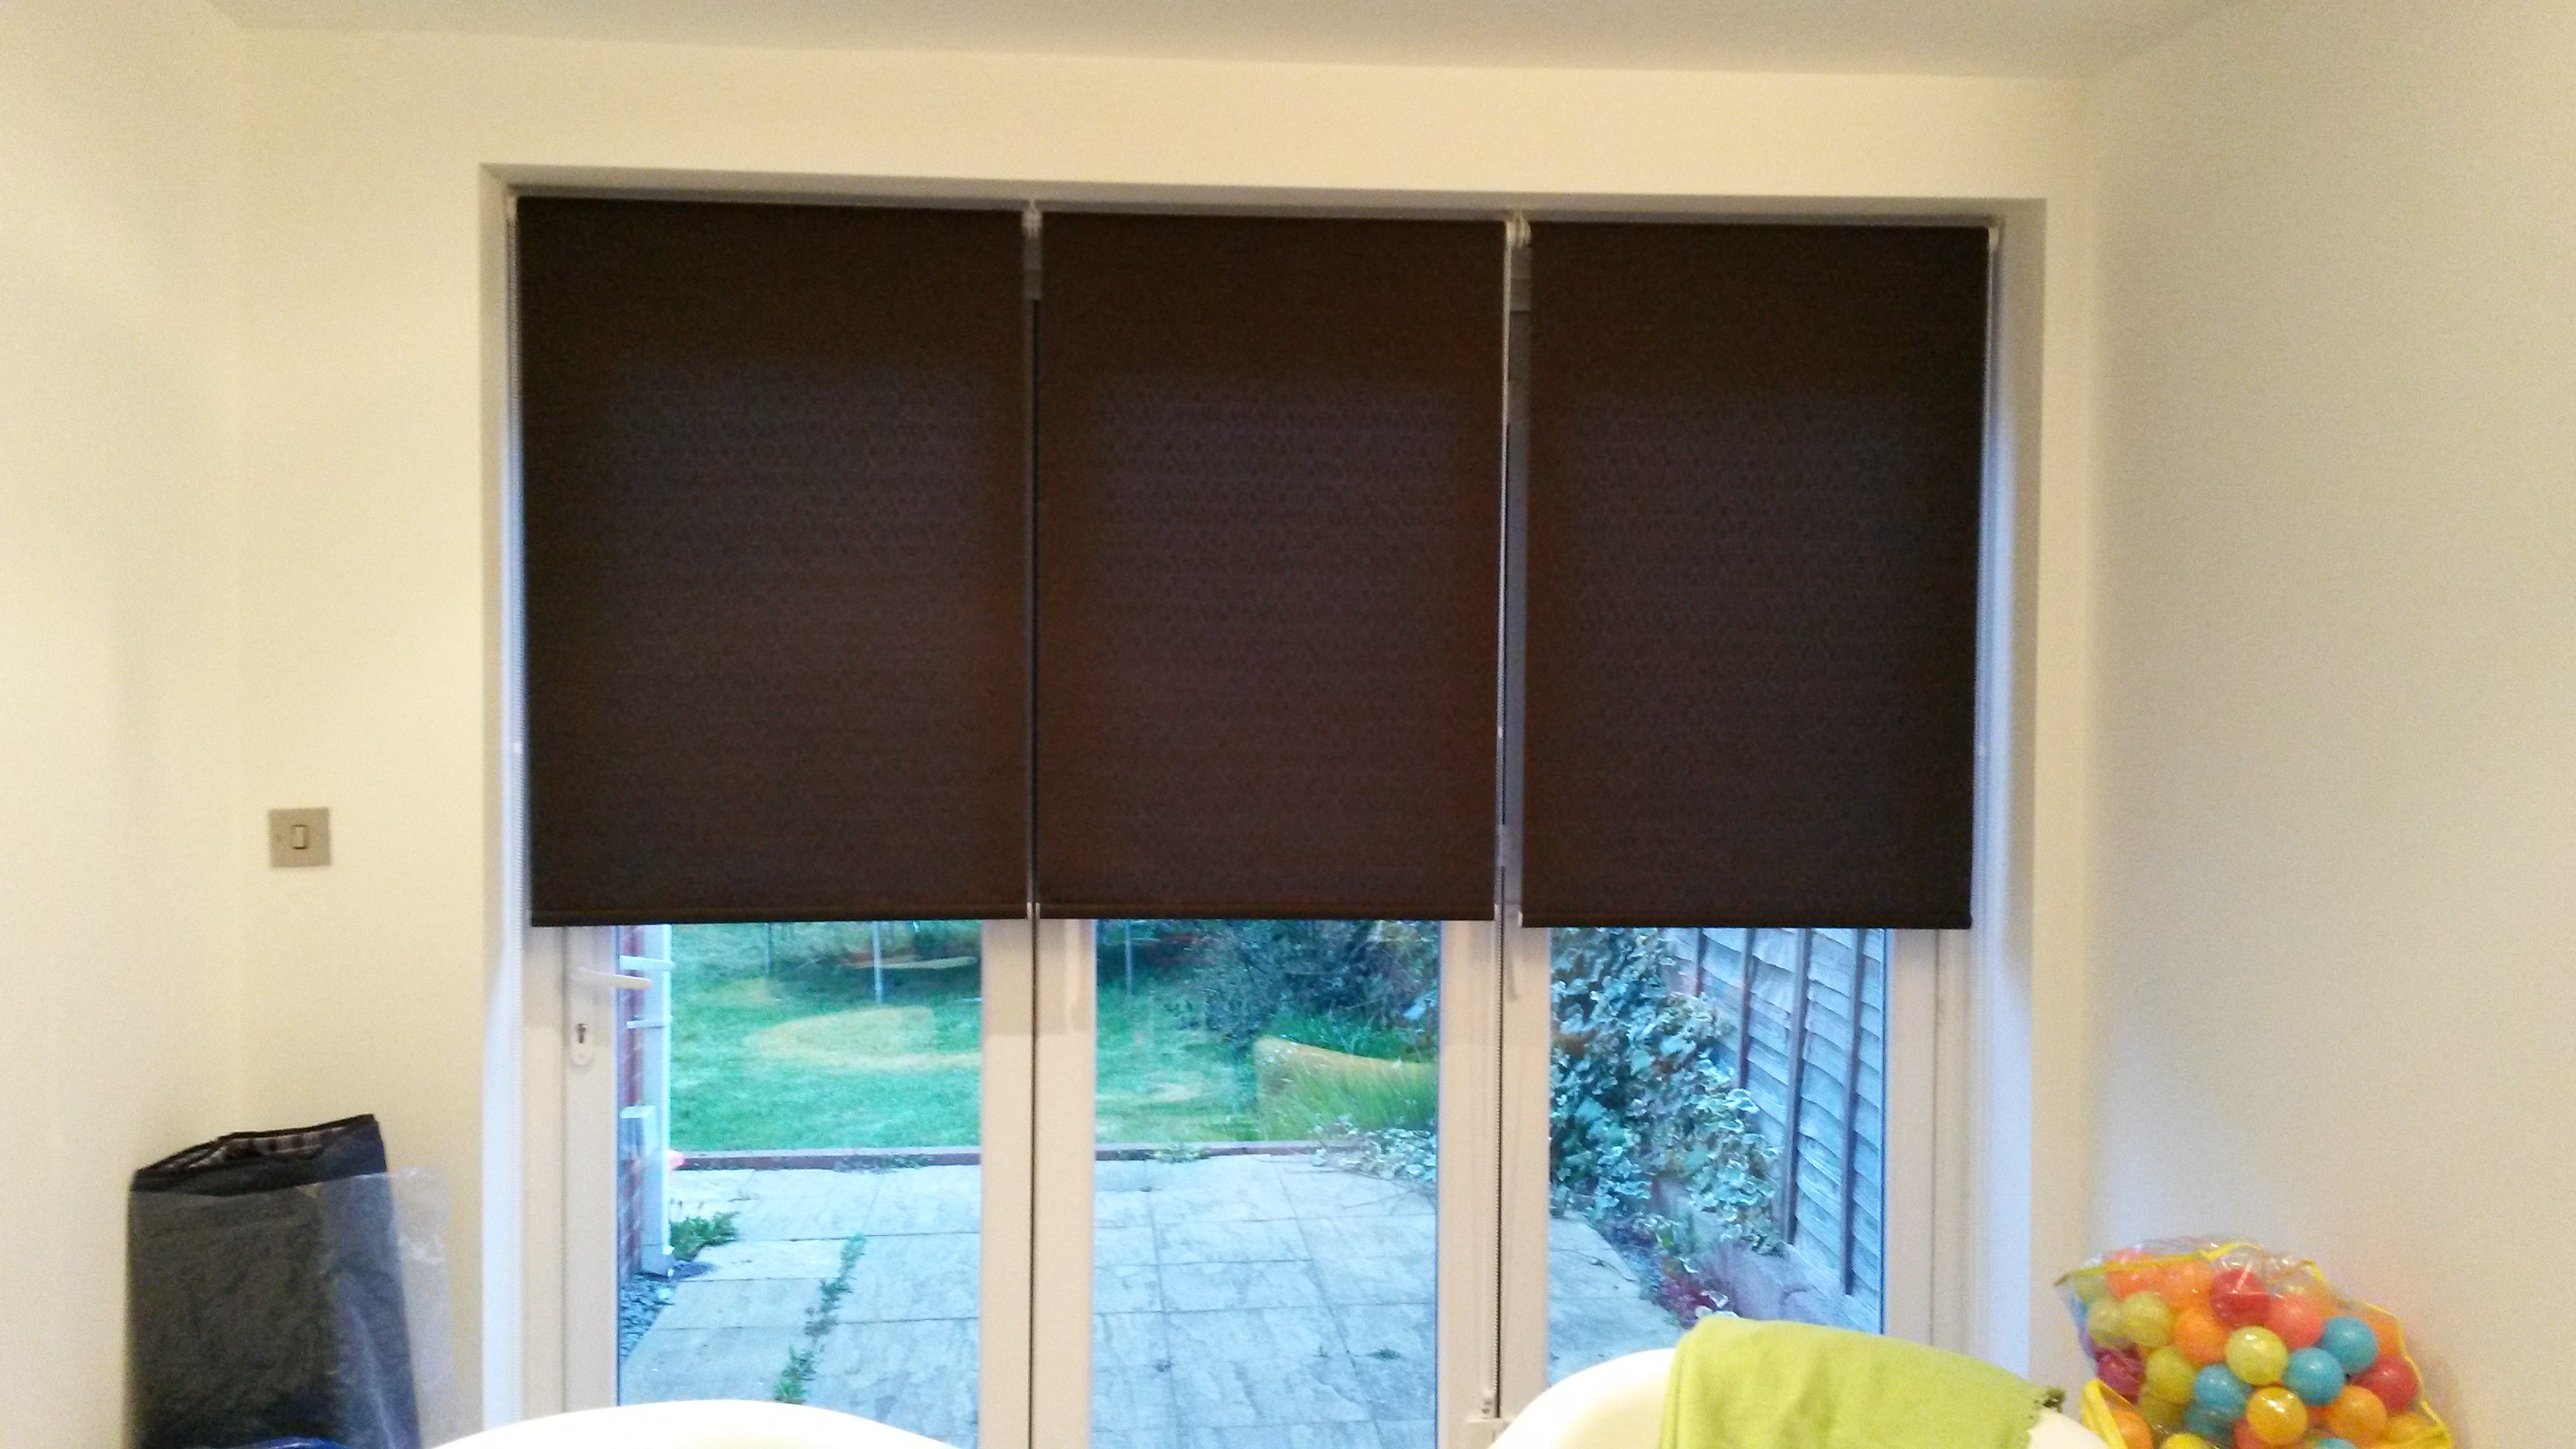 Paramount Blinds Ltd Birmingham Curtains Amp Blinds